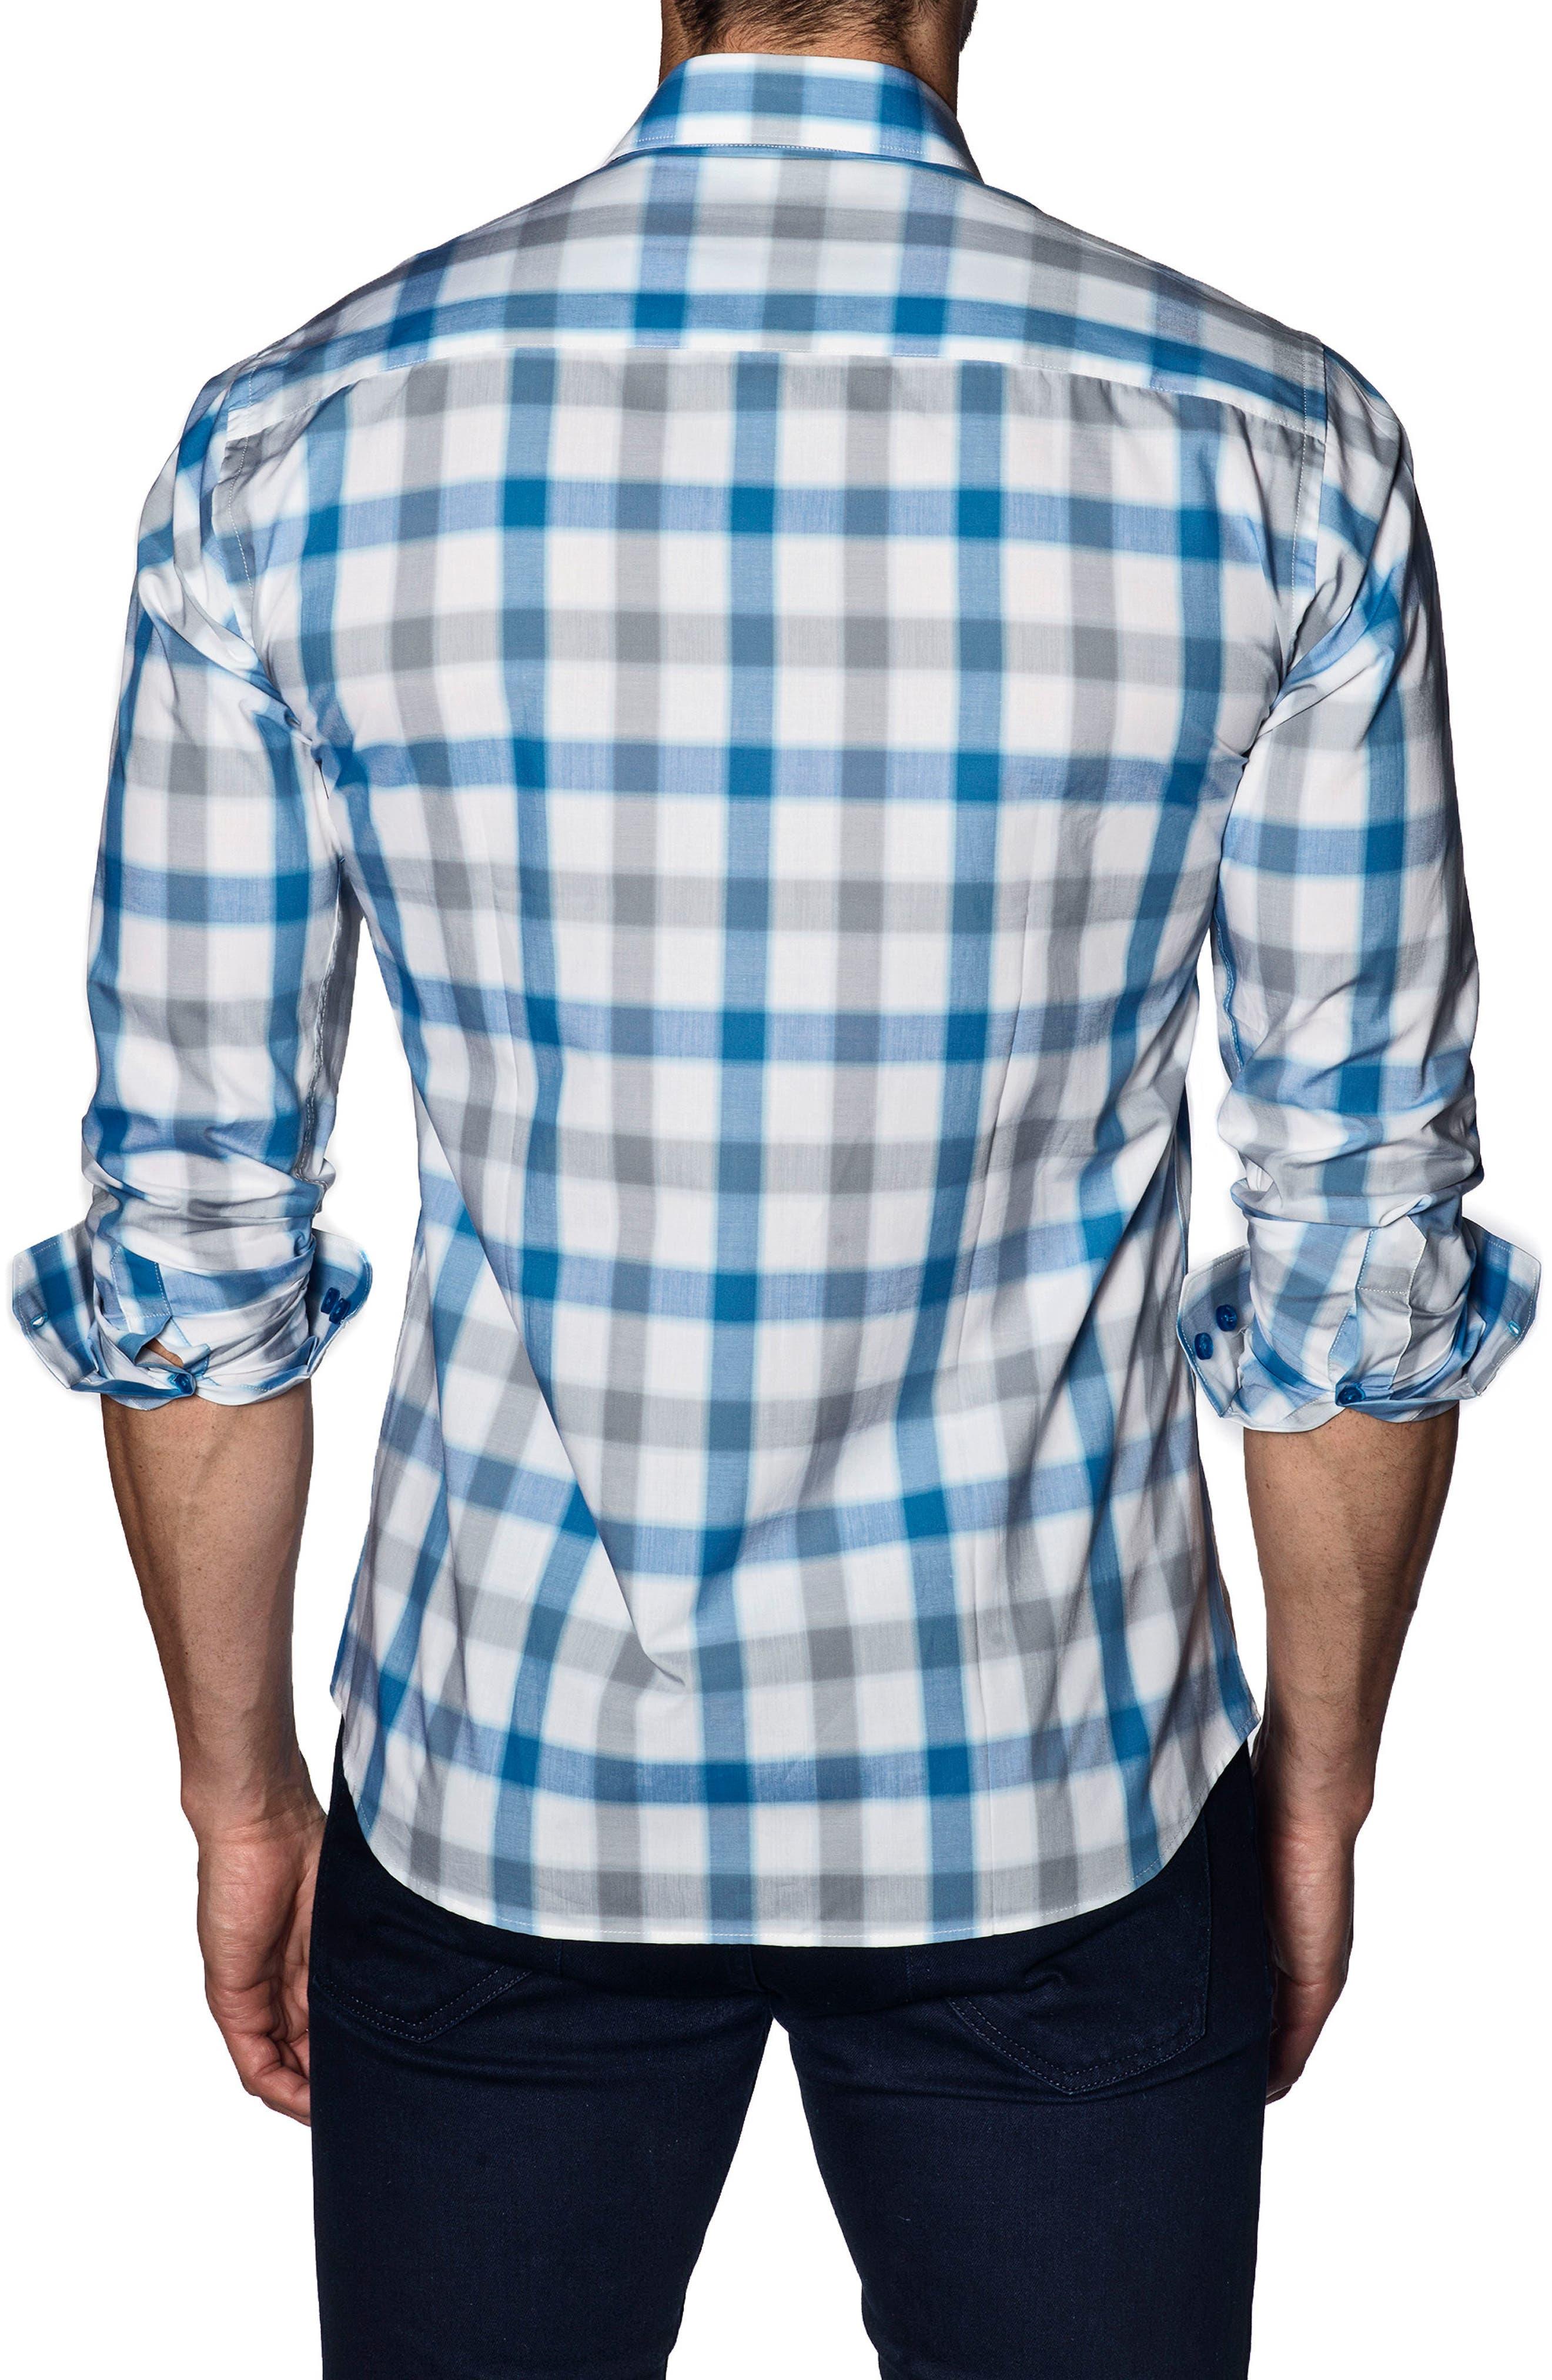 Trim Fit Sport Shirt,                             Alternate thumbnail 2, color,                             White Blue Check